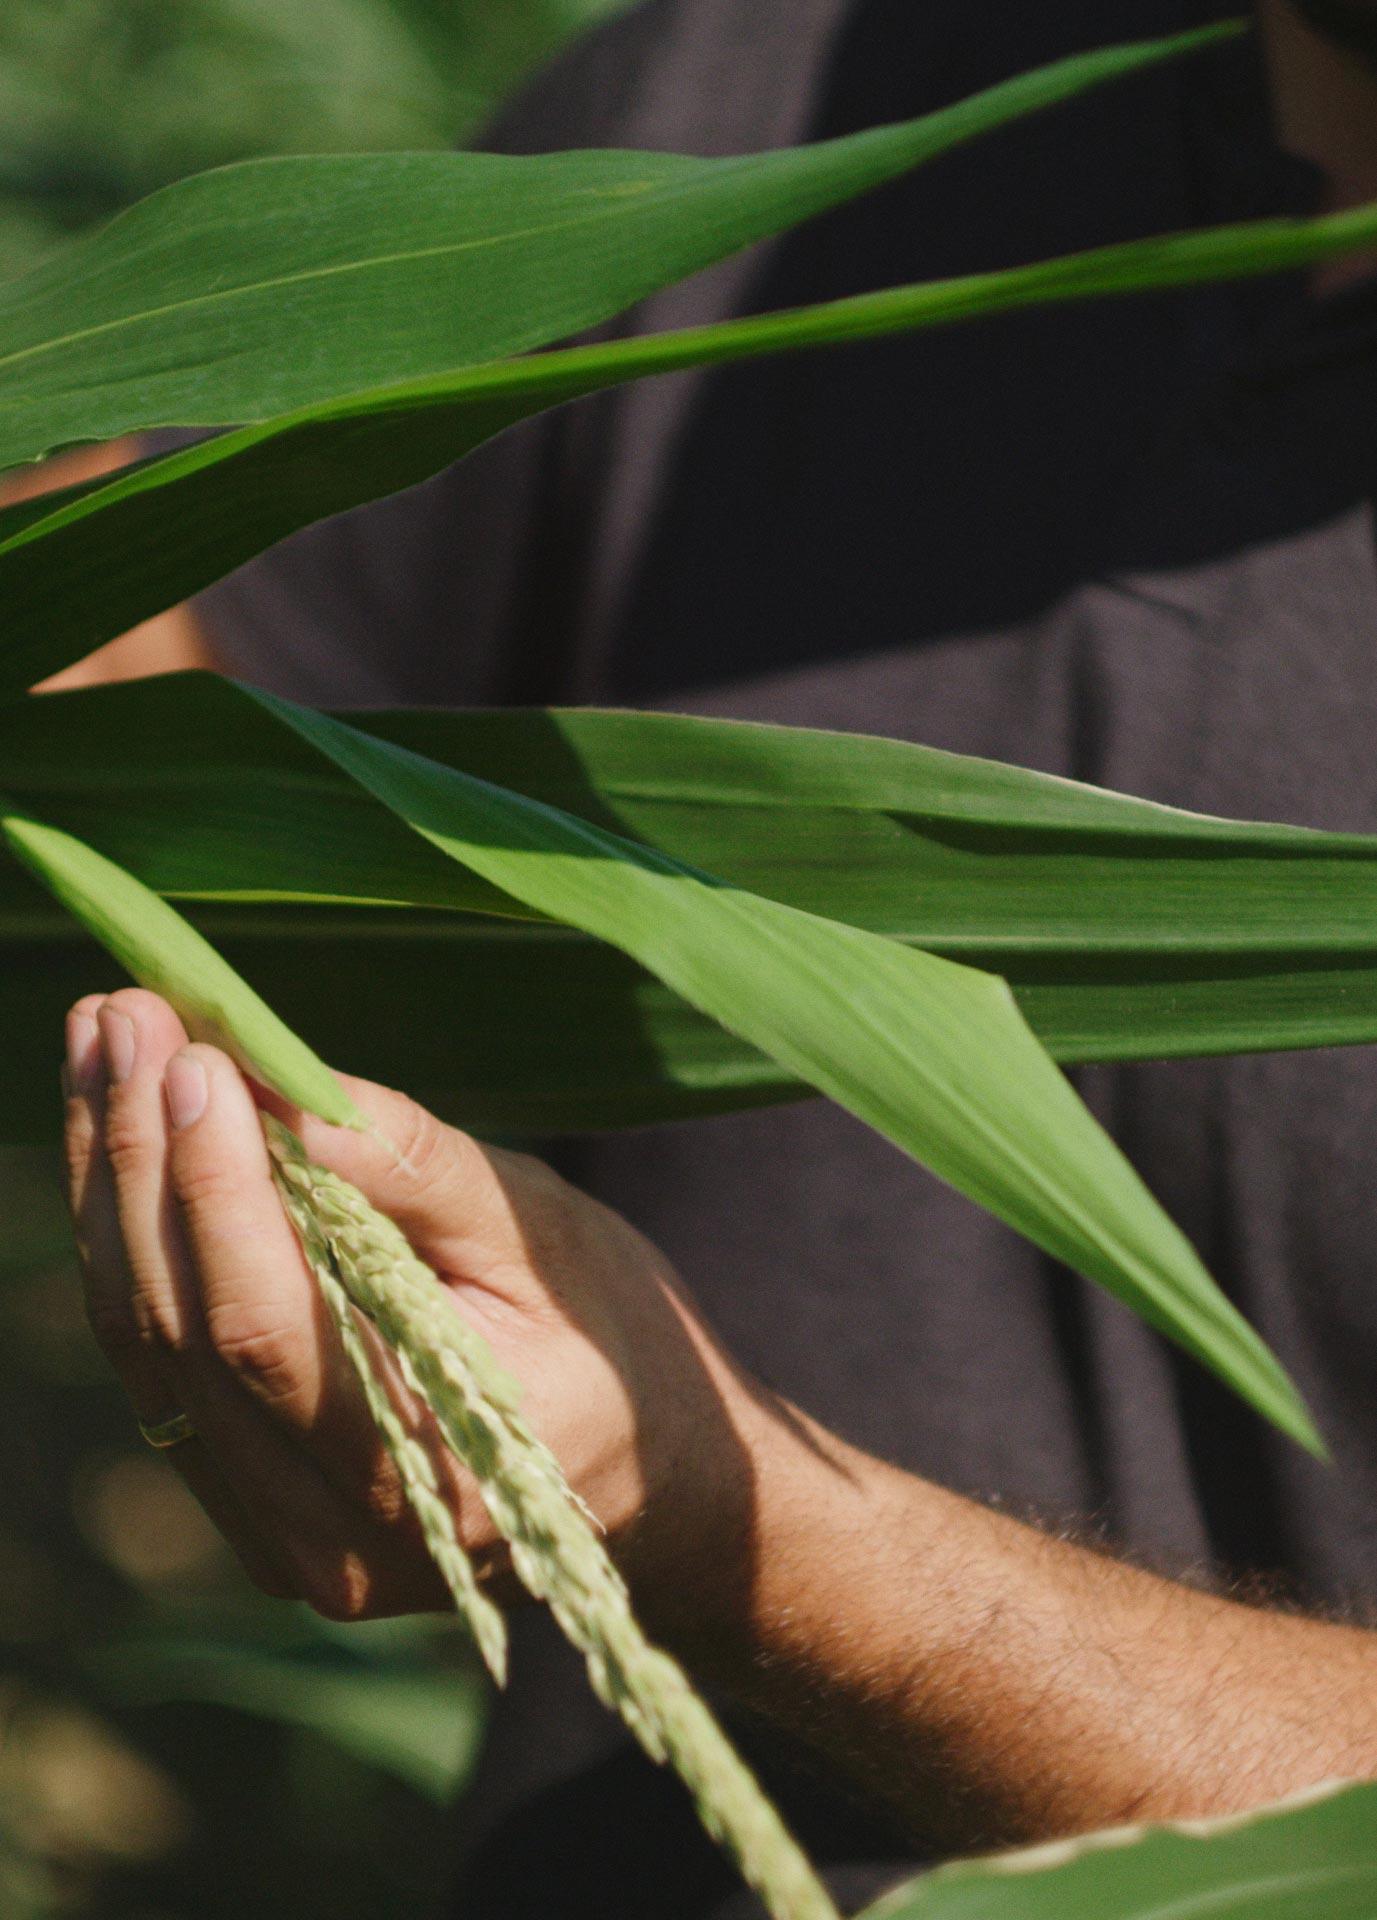 Background image of hand holding wheat.